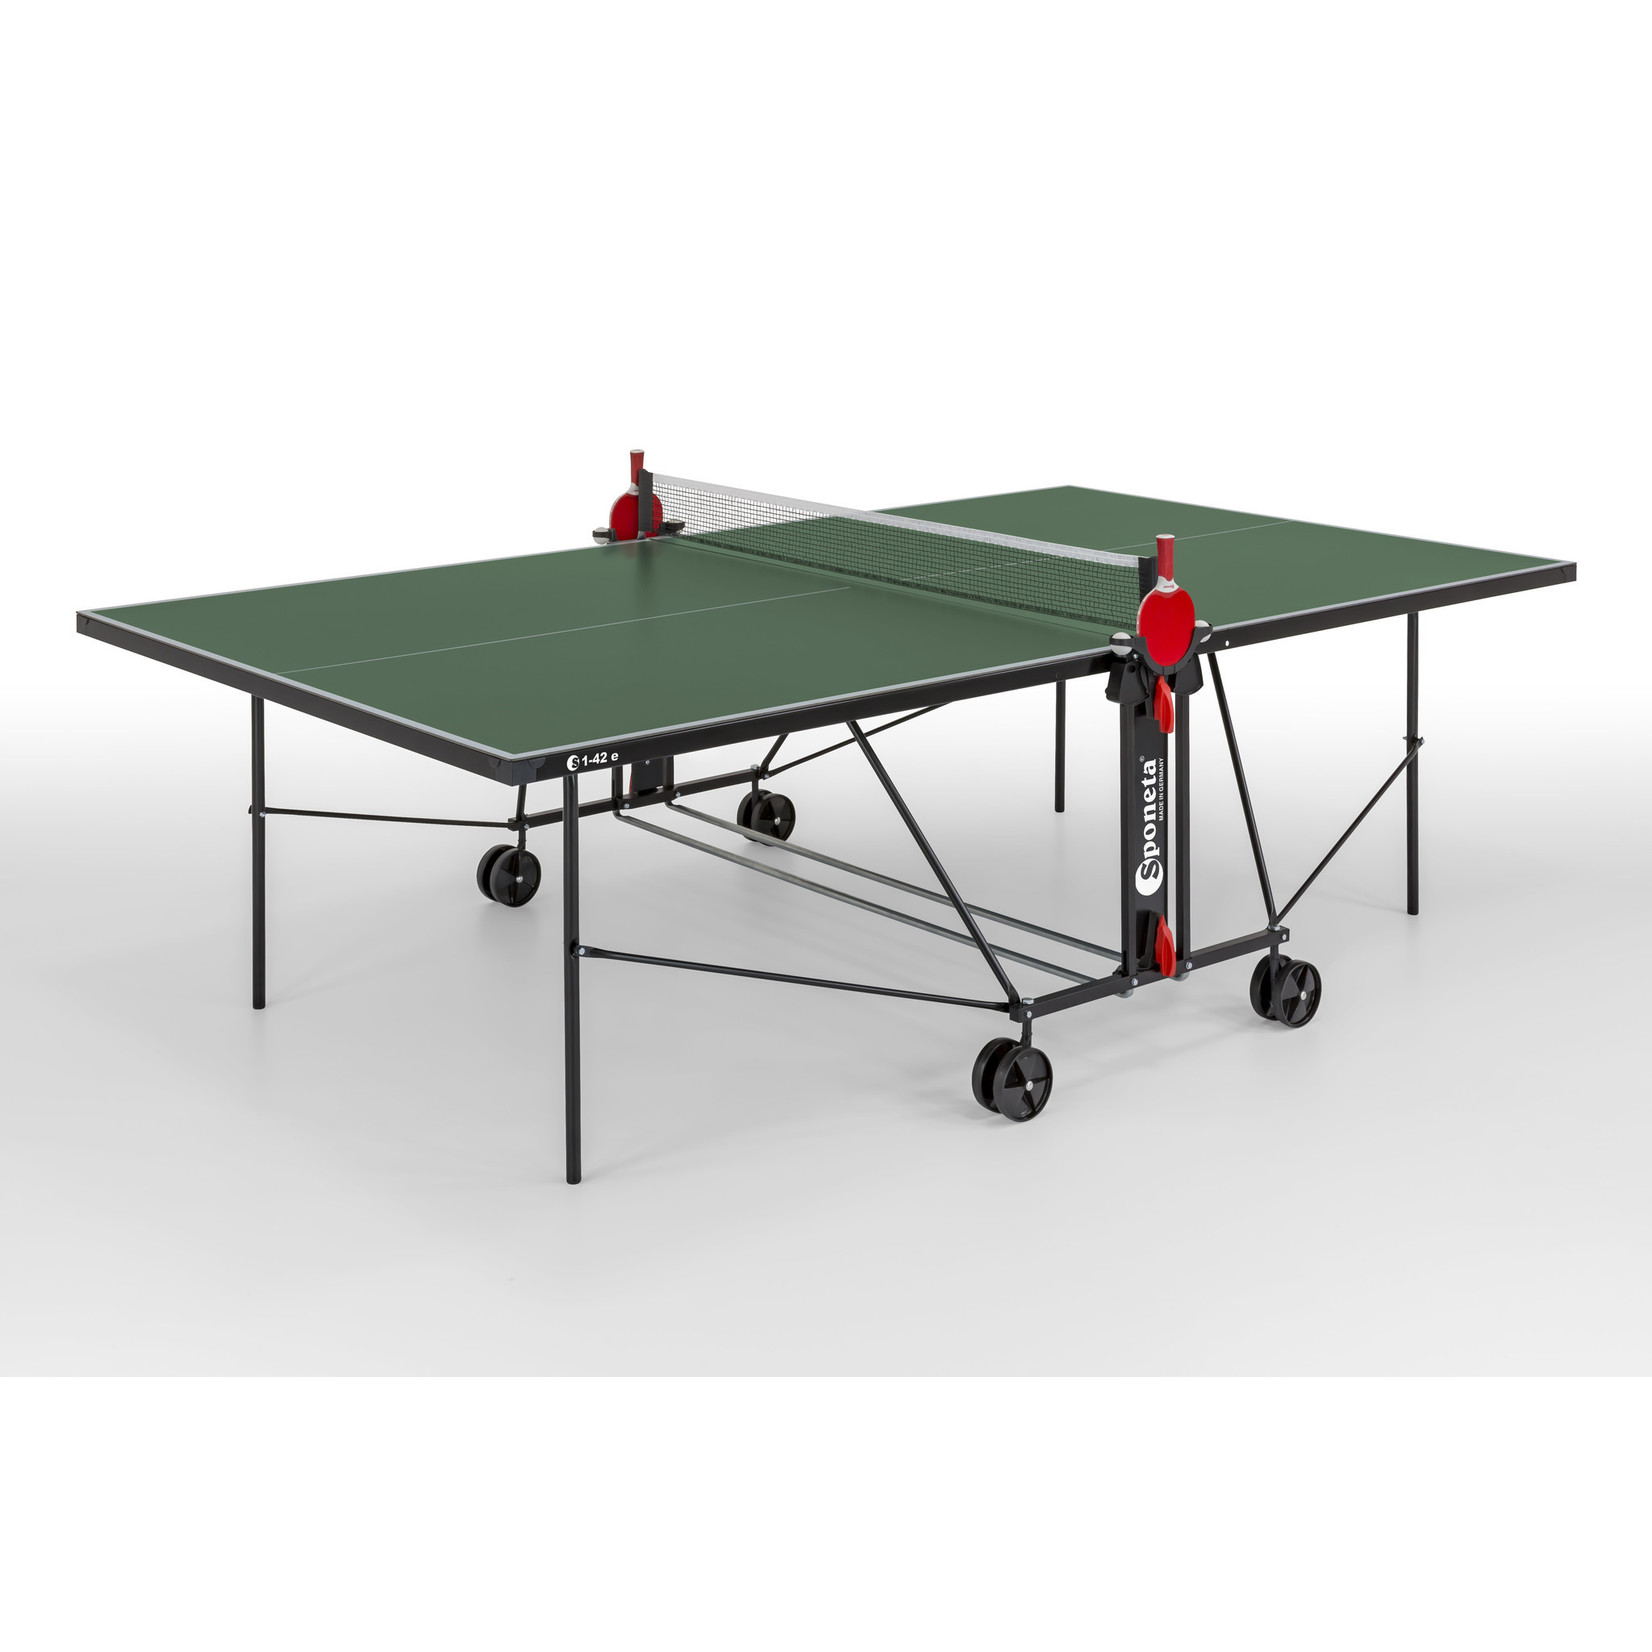 Sponeta Outdoor tafeltennistafel - Sponeta S 1-42 e